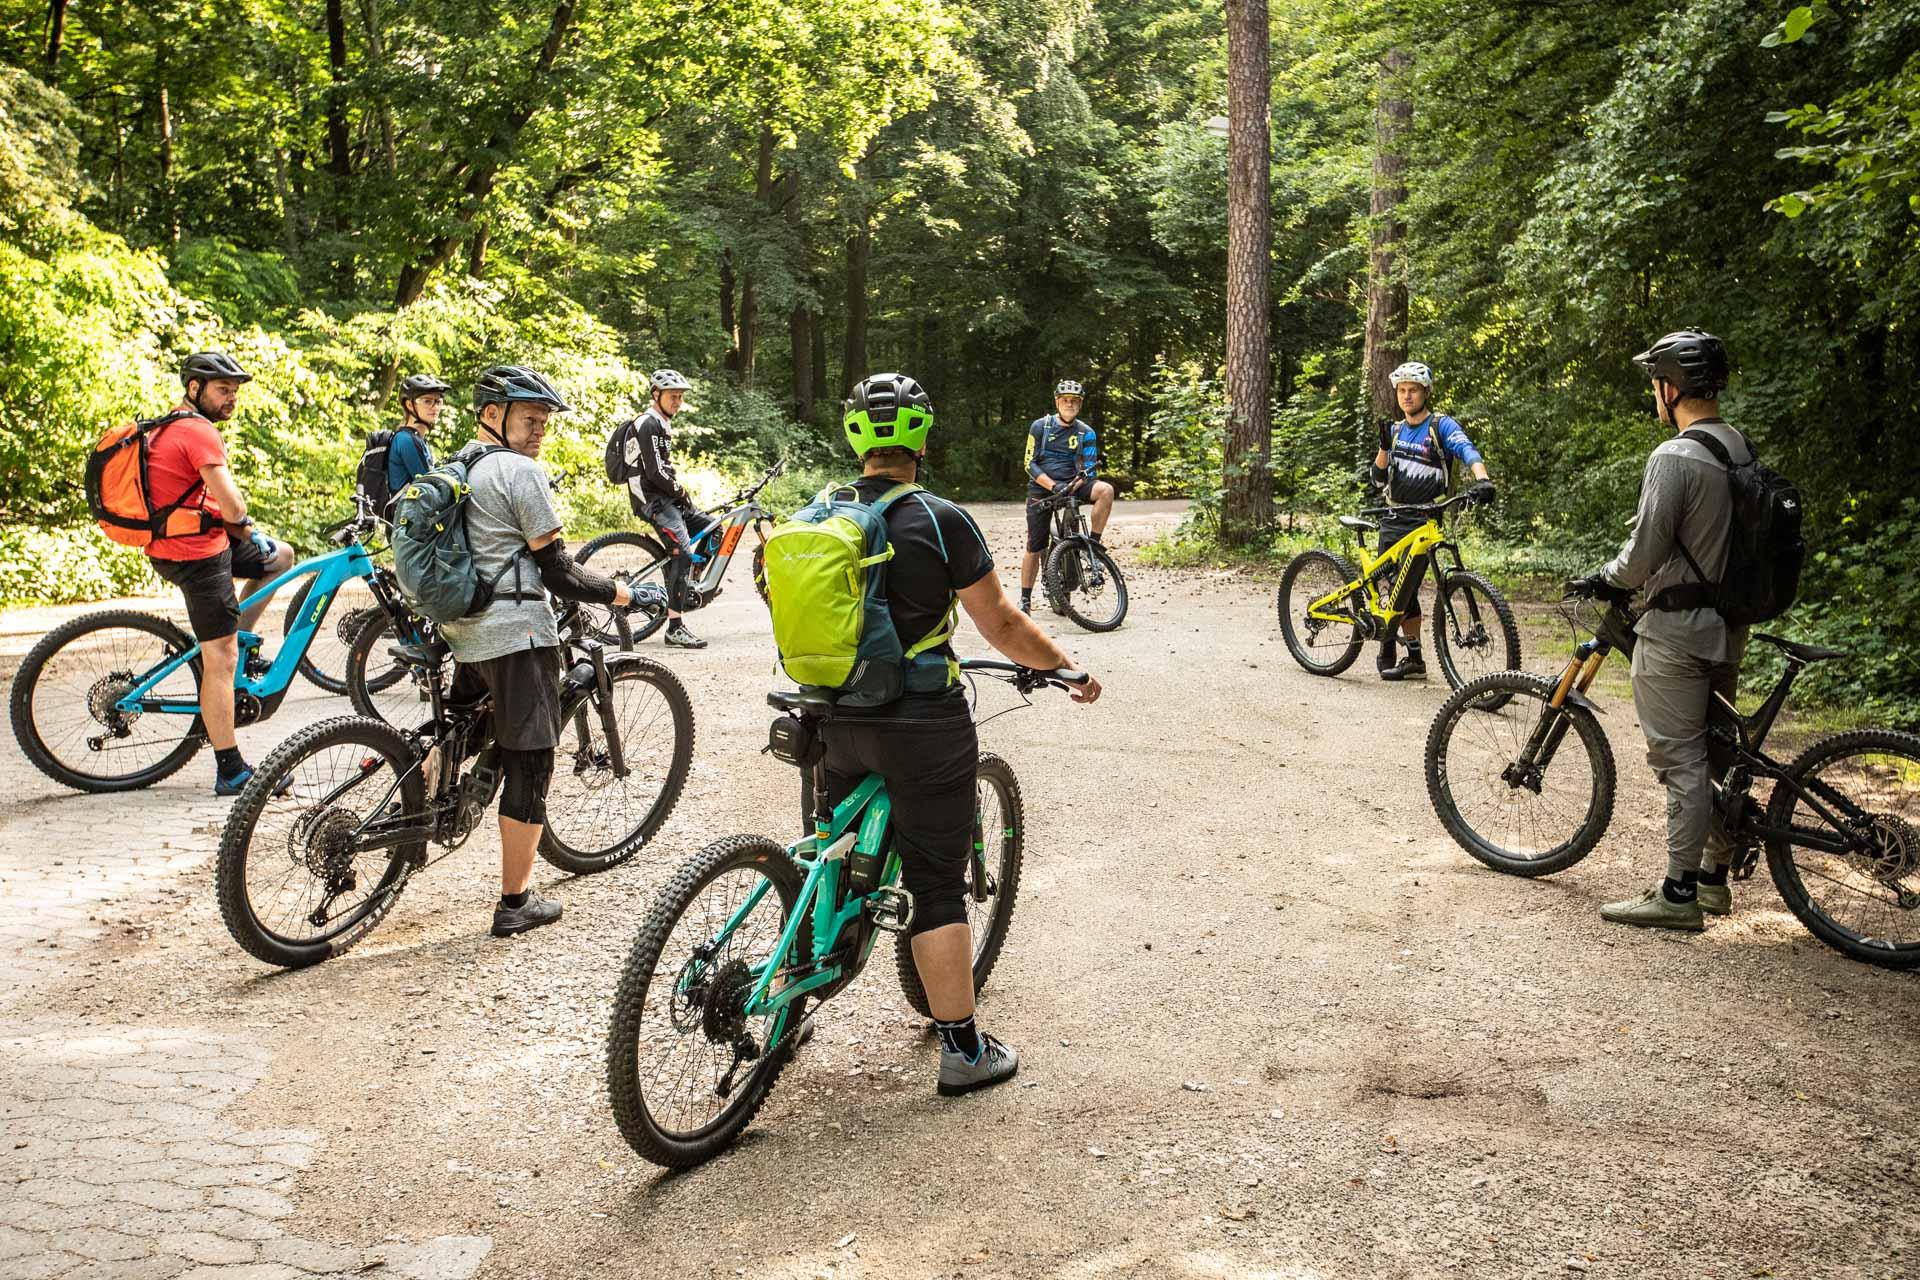 eMTB Basic Fahrtechnik Kurs Gummersbach | Wiehl Rock my Trail Bikeschule